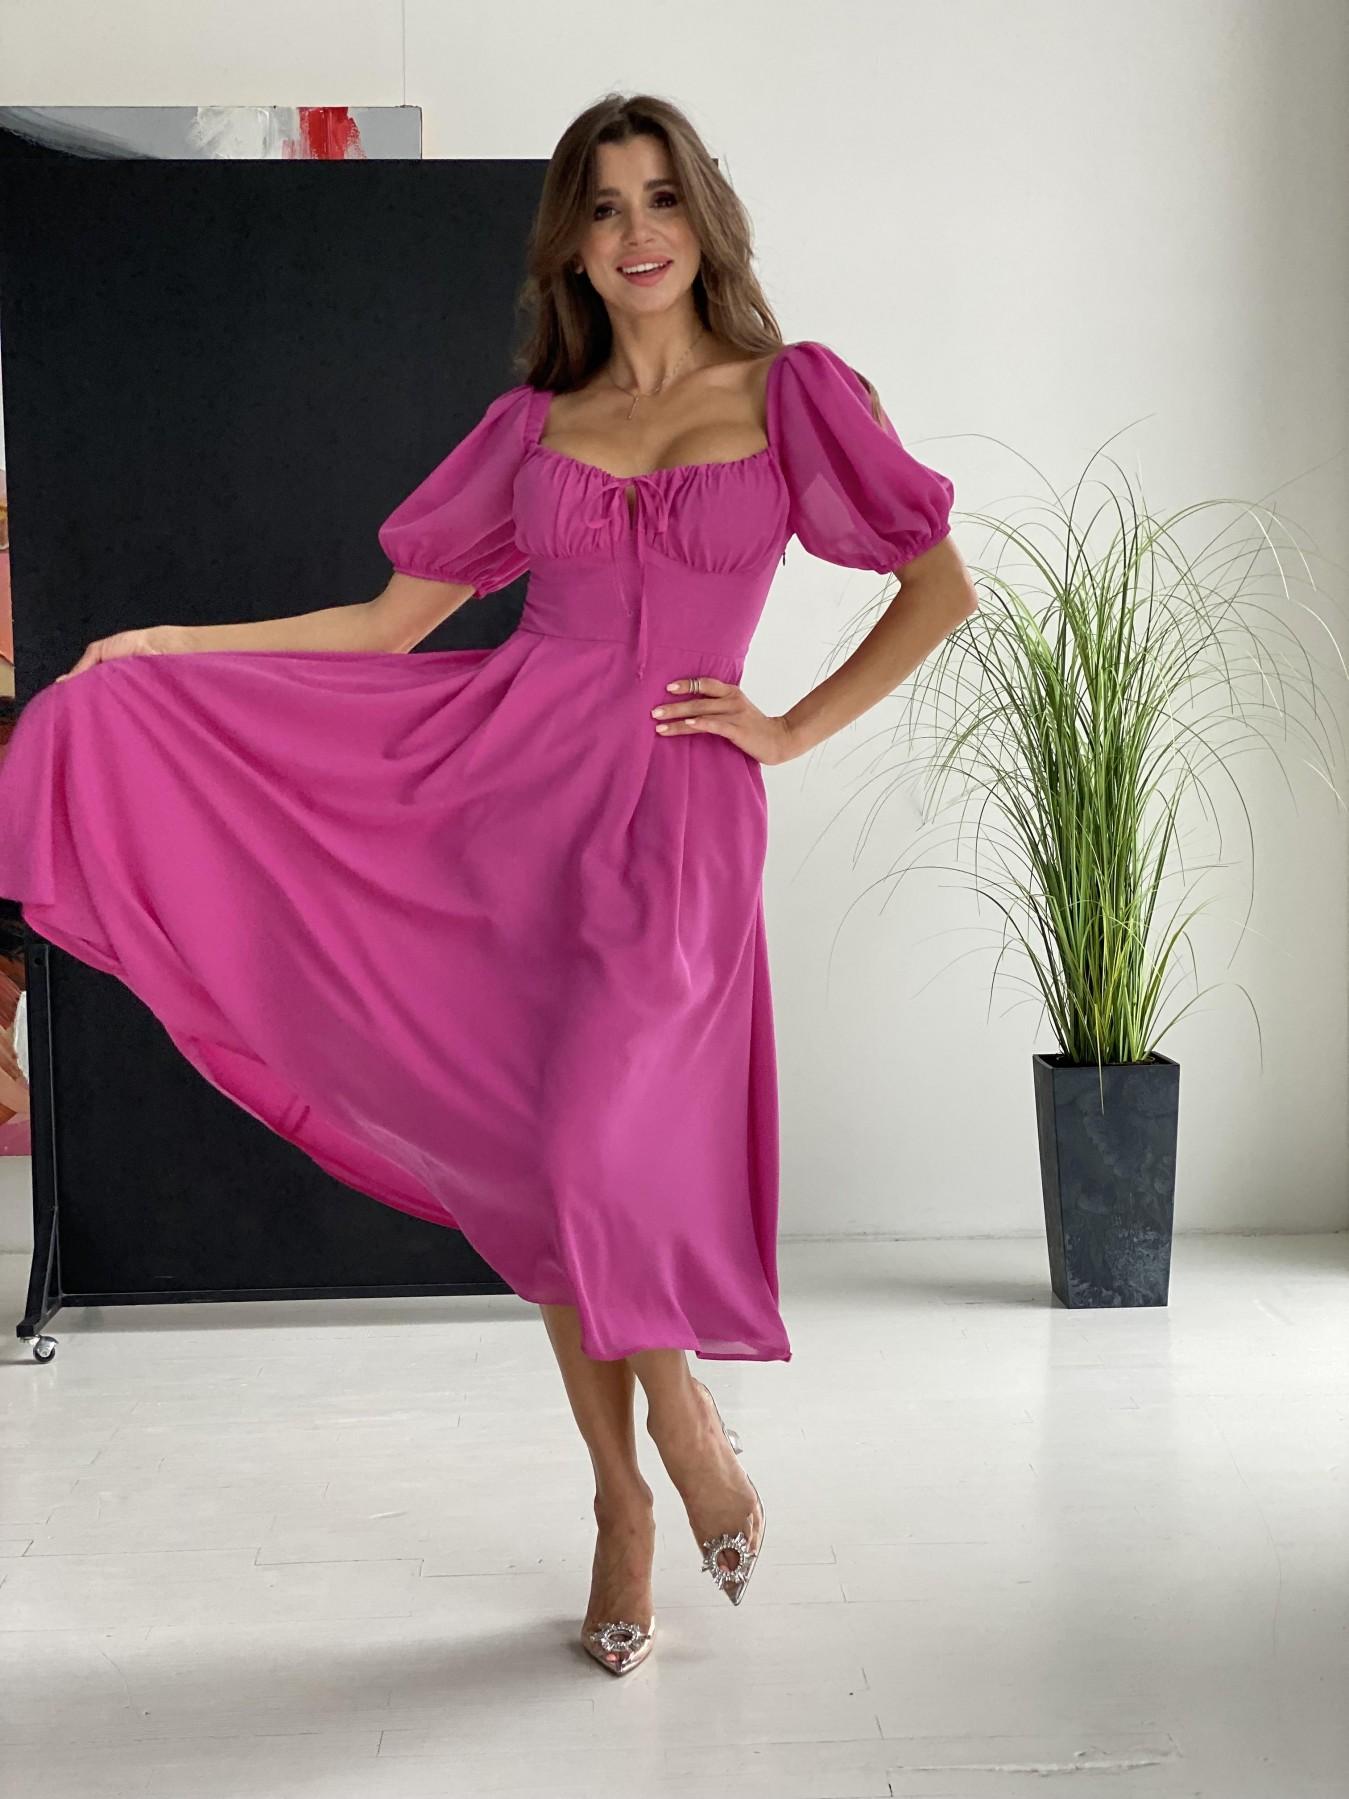 Кисес Миди платье шифон Микро однотонный 11603 АРТ. 48282 Цвет: Фуксия 16 - фото 5, интернет магазин tm-modus.ru